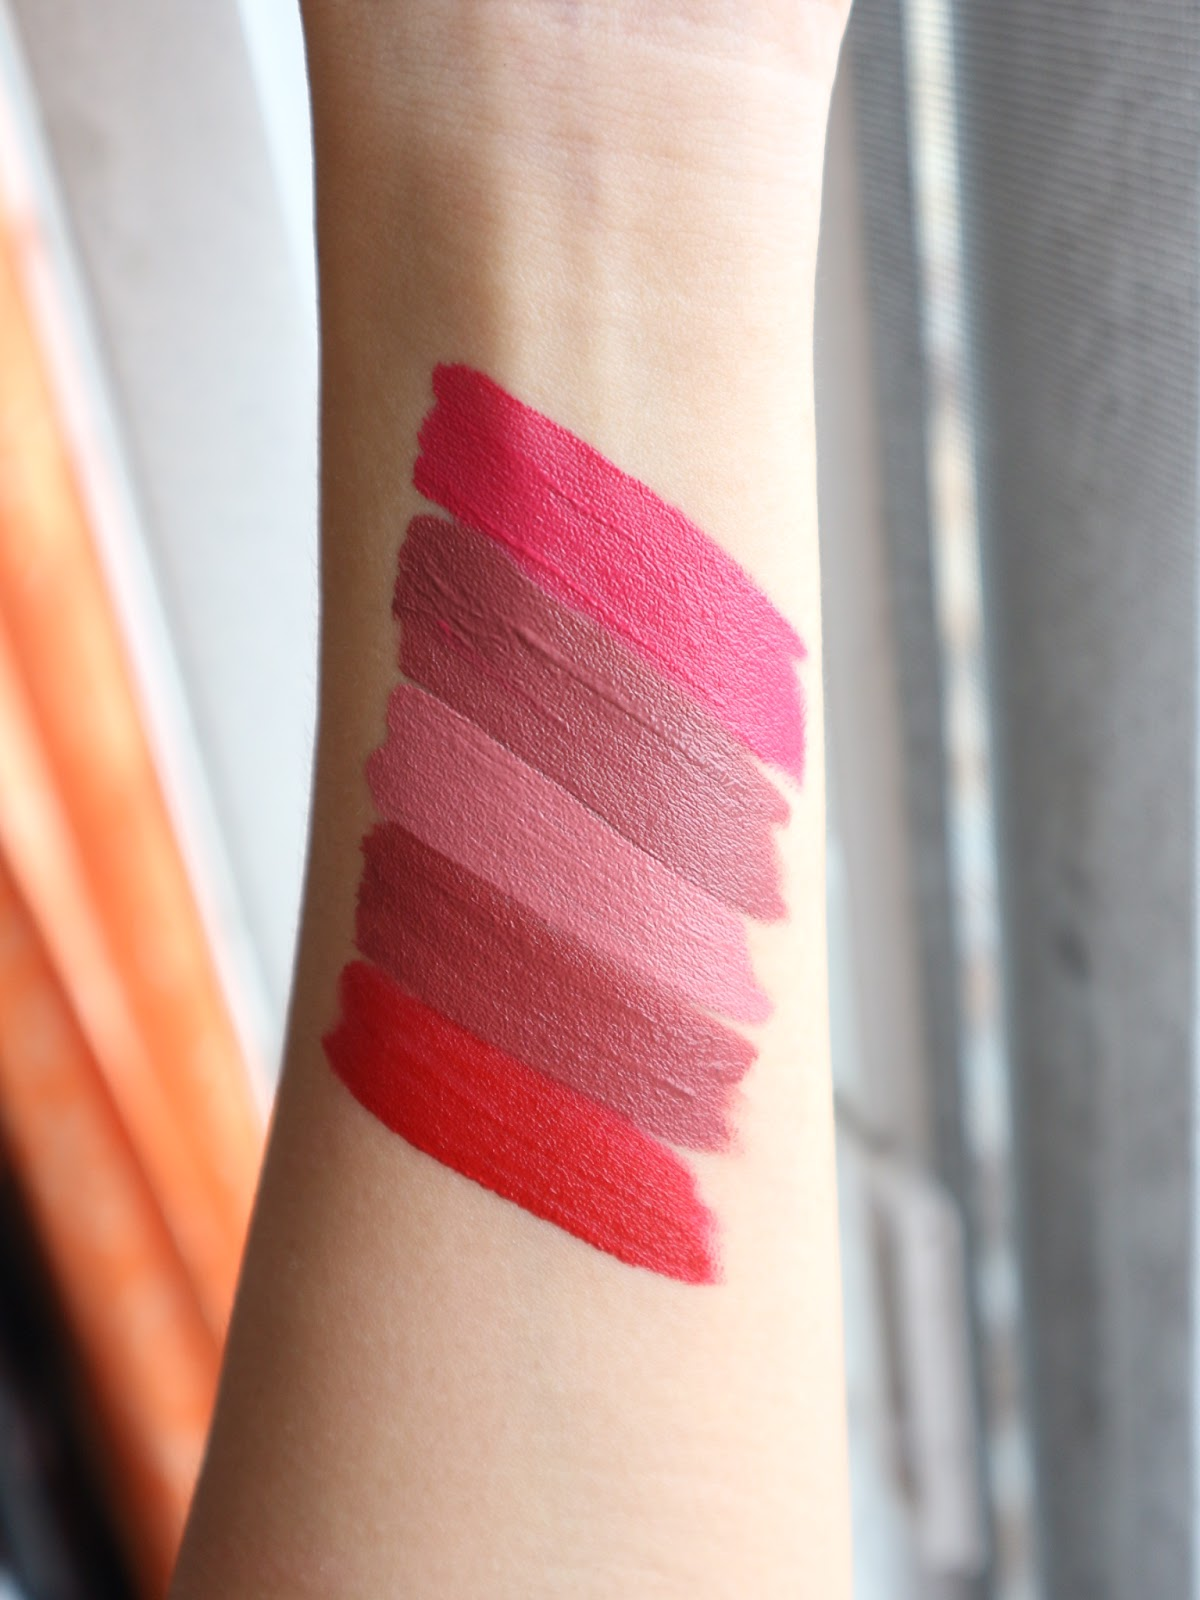 Kris Aquino Liquid Lipstick Review Swatch Kris Life Kit Ever Bilena Loyal Lucky Life Love Laugh